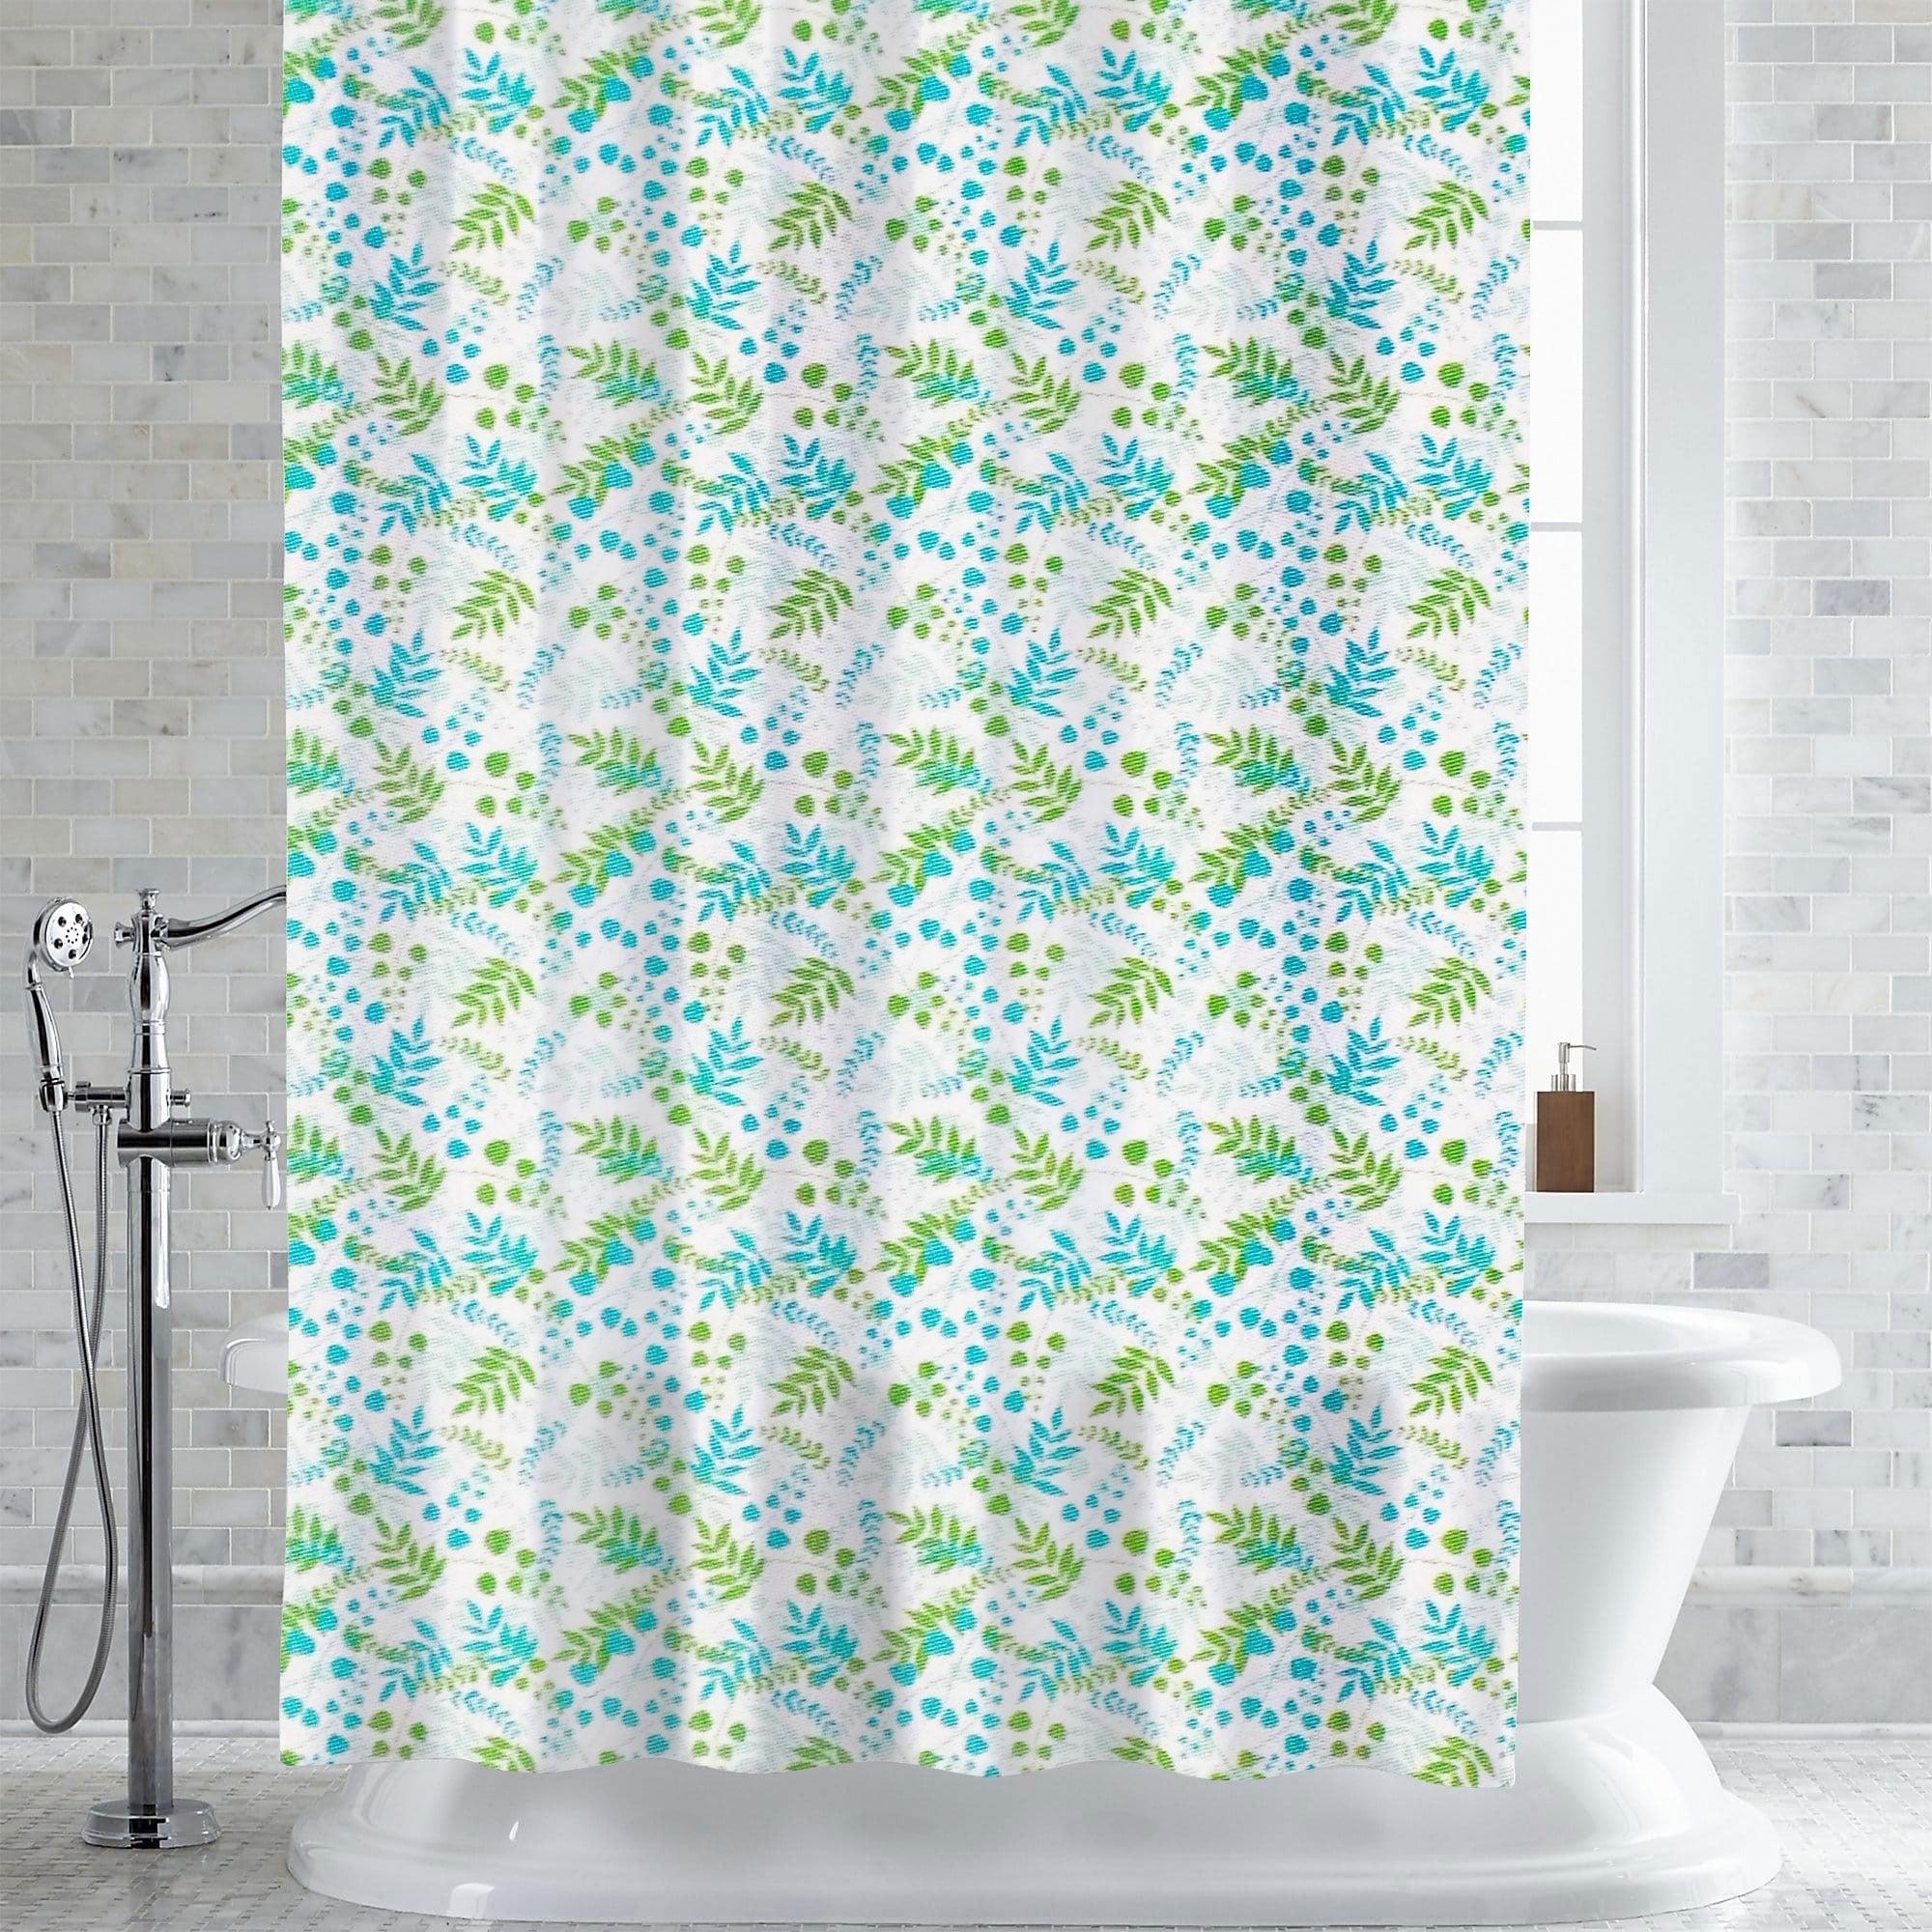 Shop Bruno Foliage Print PEVA EVA Shower Curtain Liner 70x72